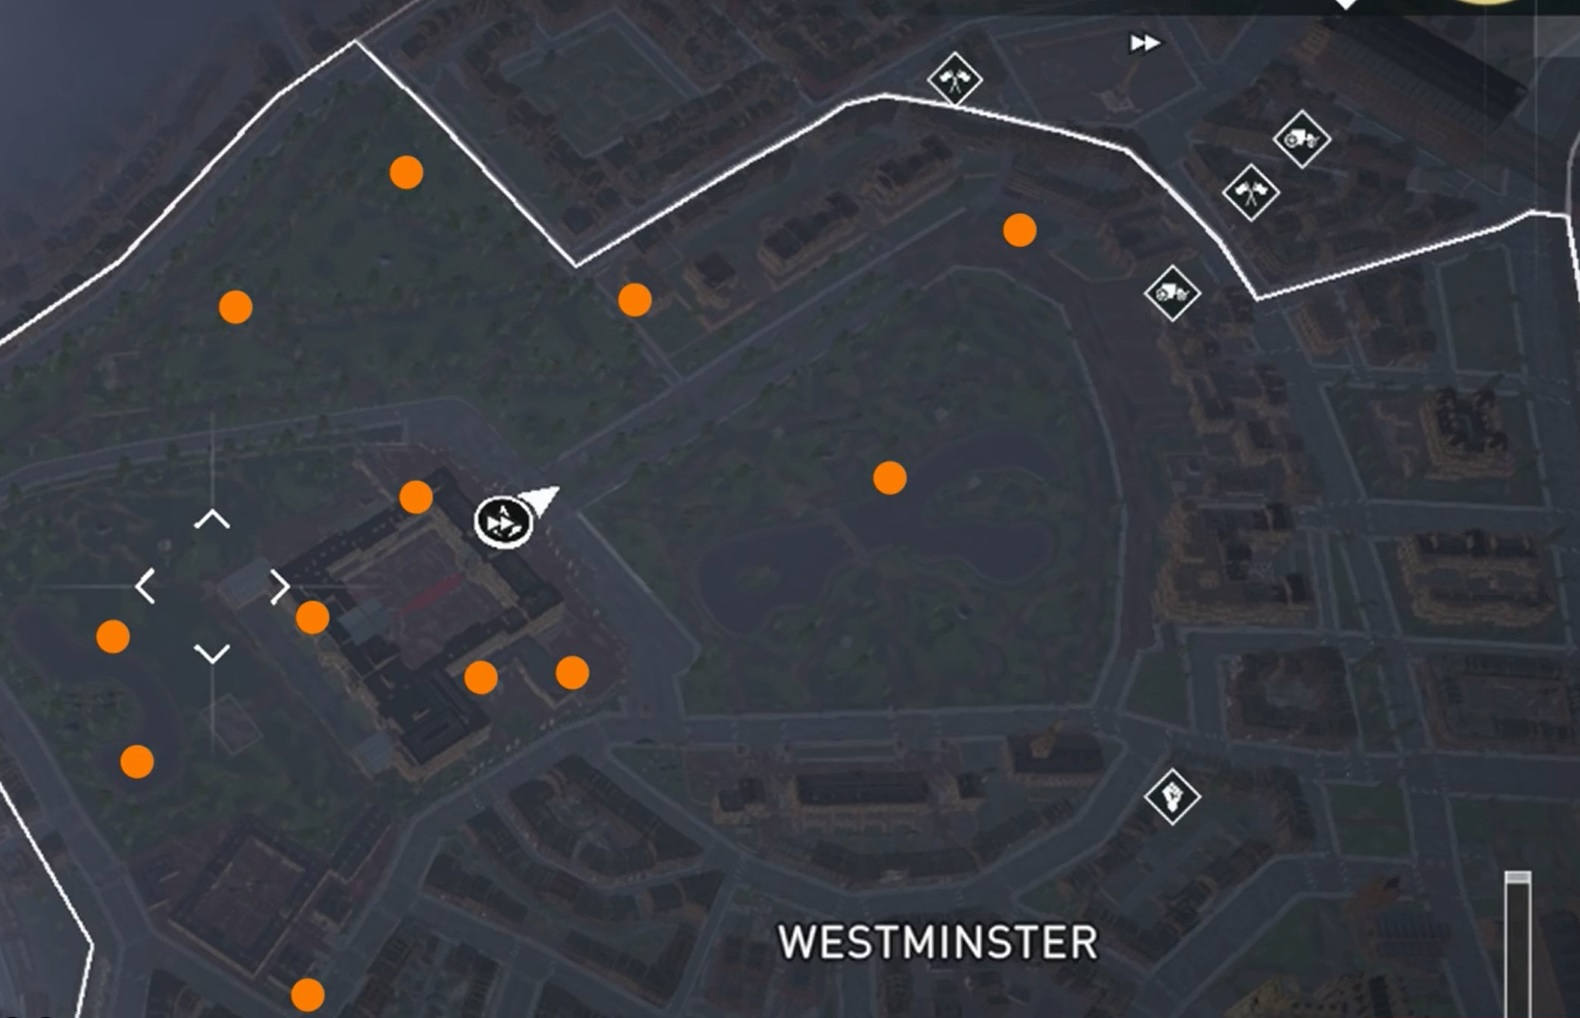 assassins creed syndicate londoner geheimnisse karte Assassin's Creed – Syndicate: Alle königlichen Briefe – Fundorte